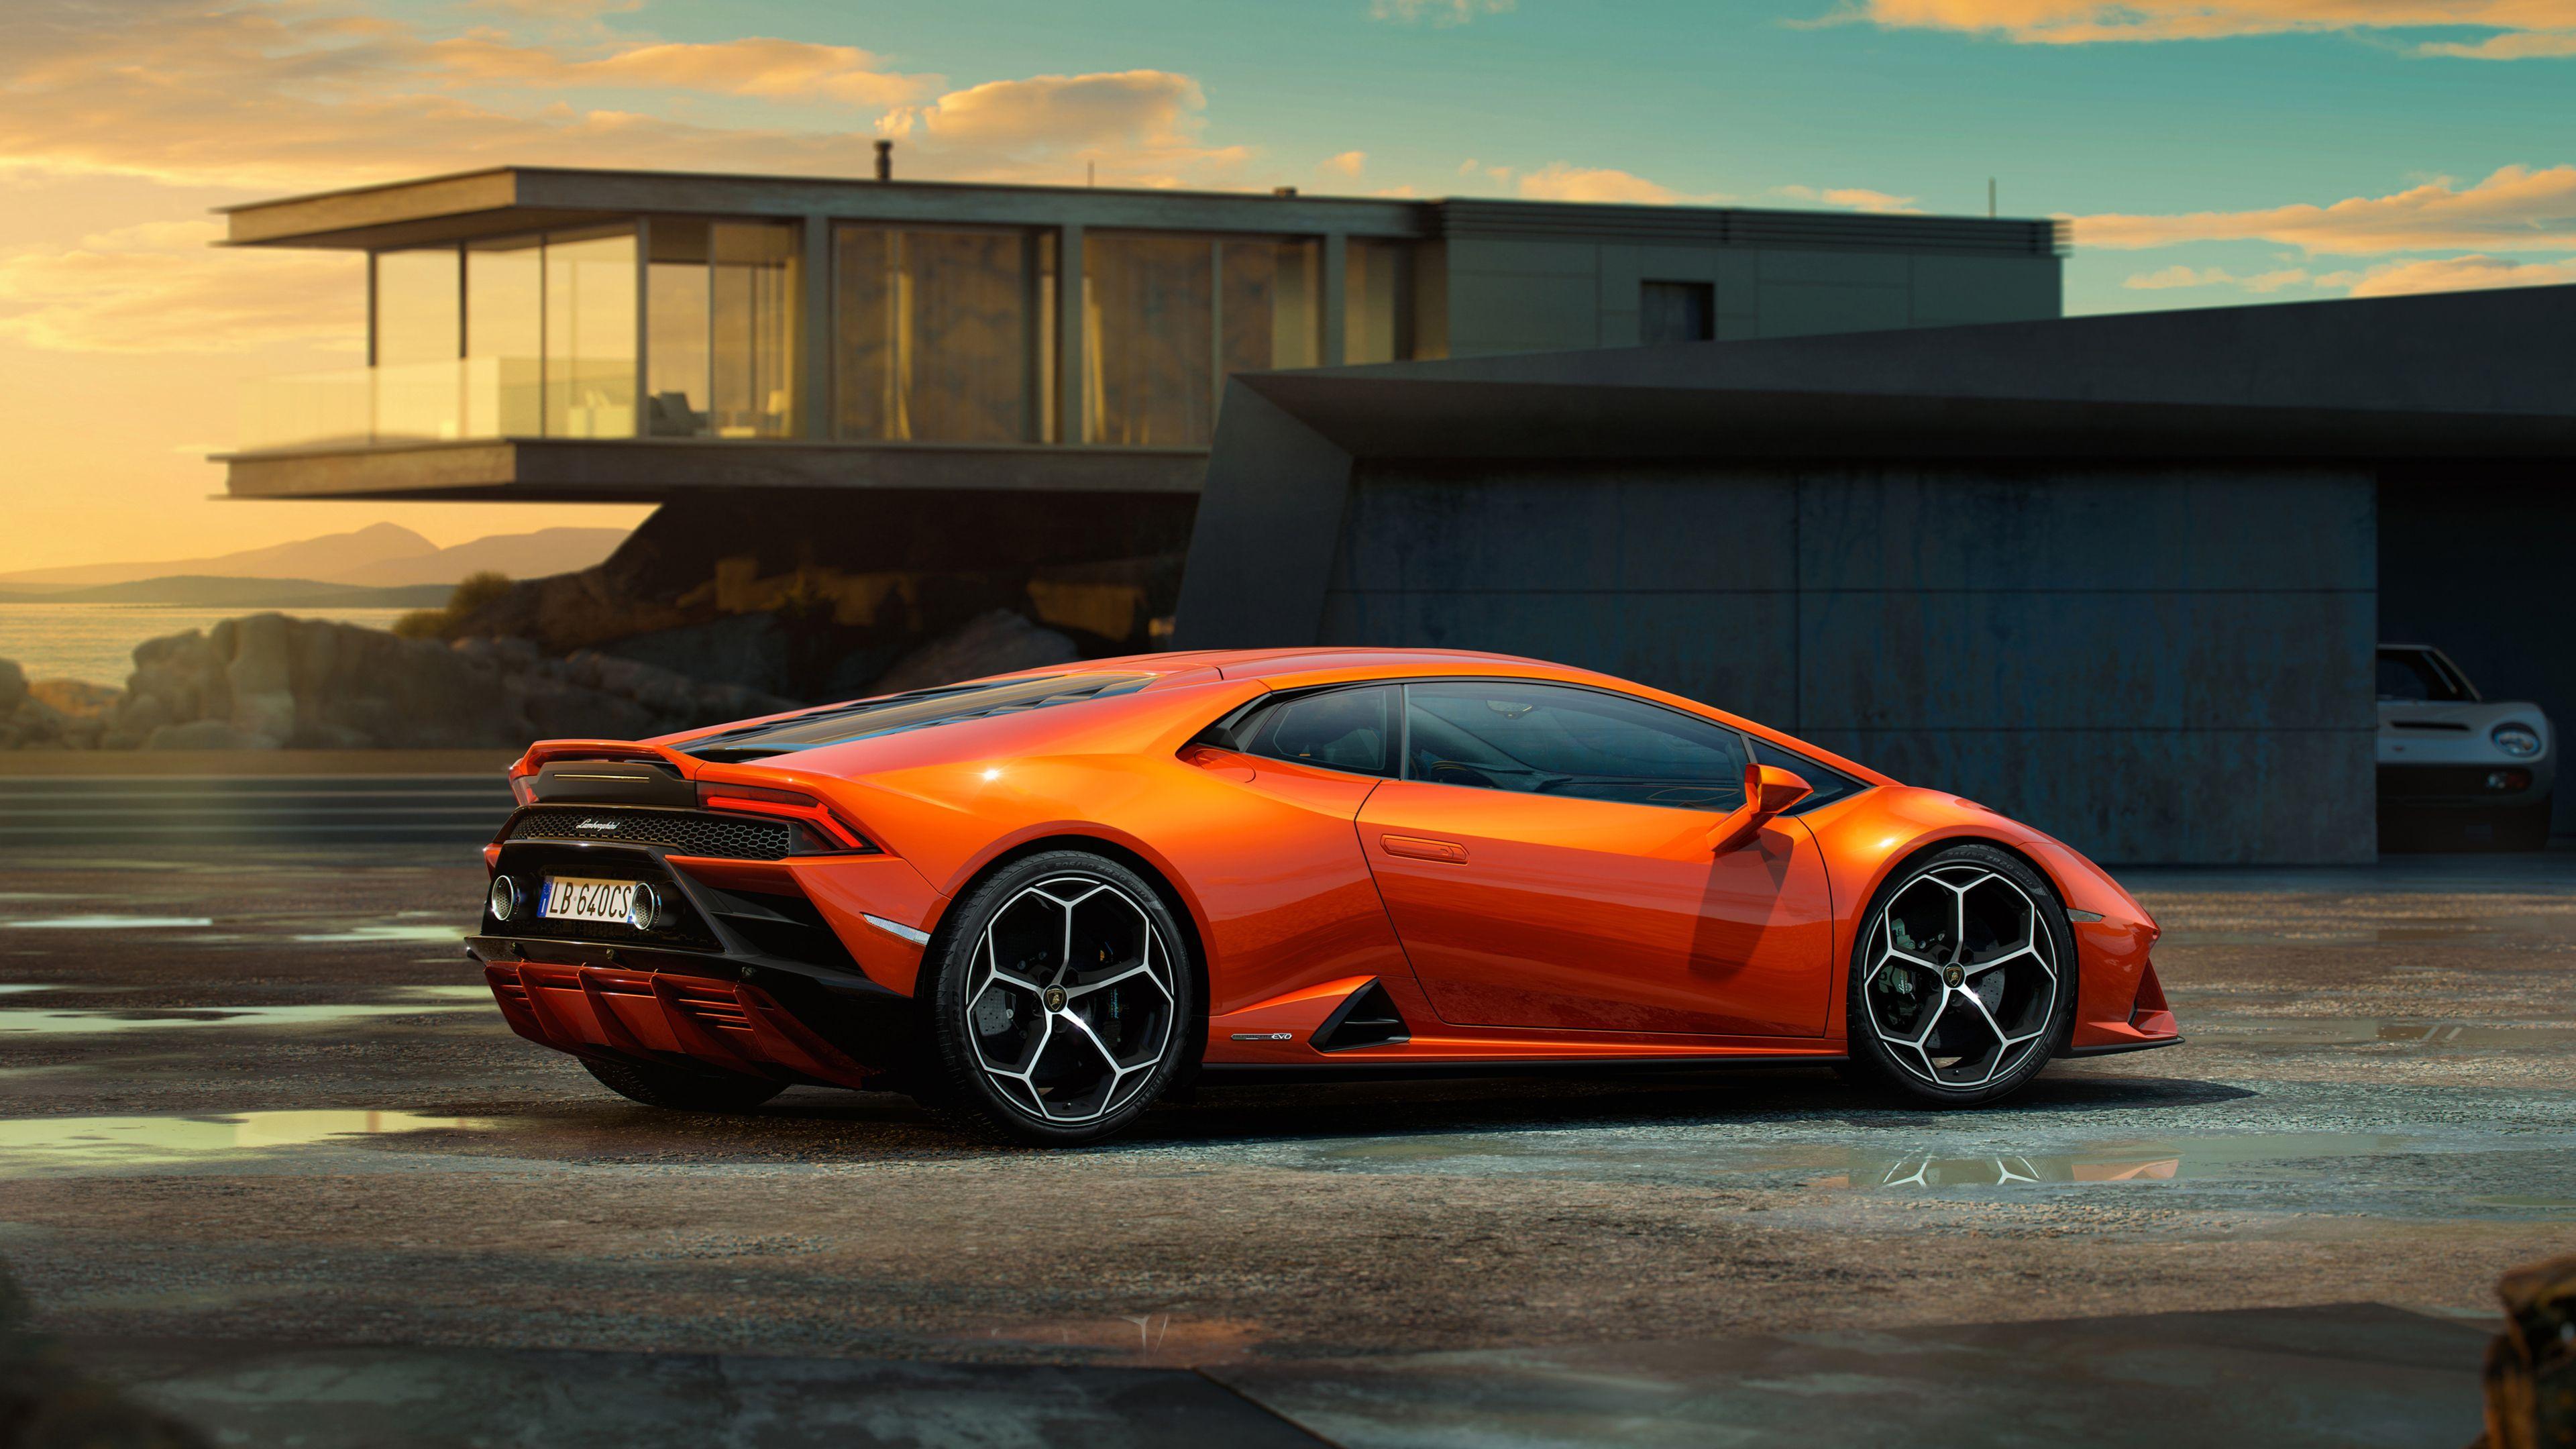 Lamborghini Huracan EVO 2019 Side View 4k lamborghini